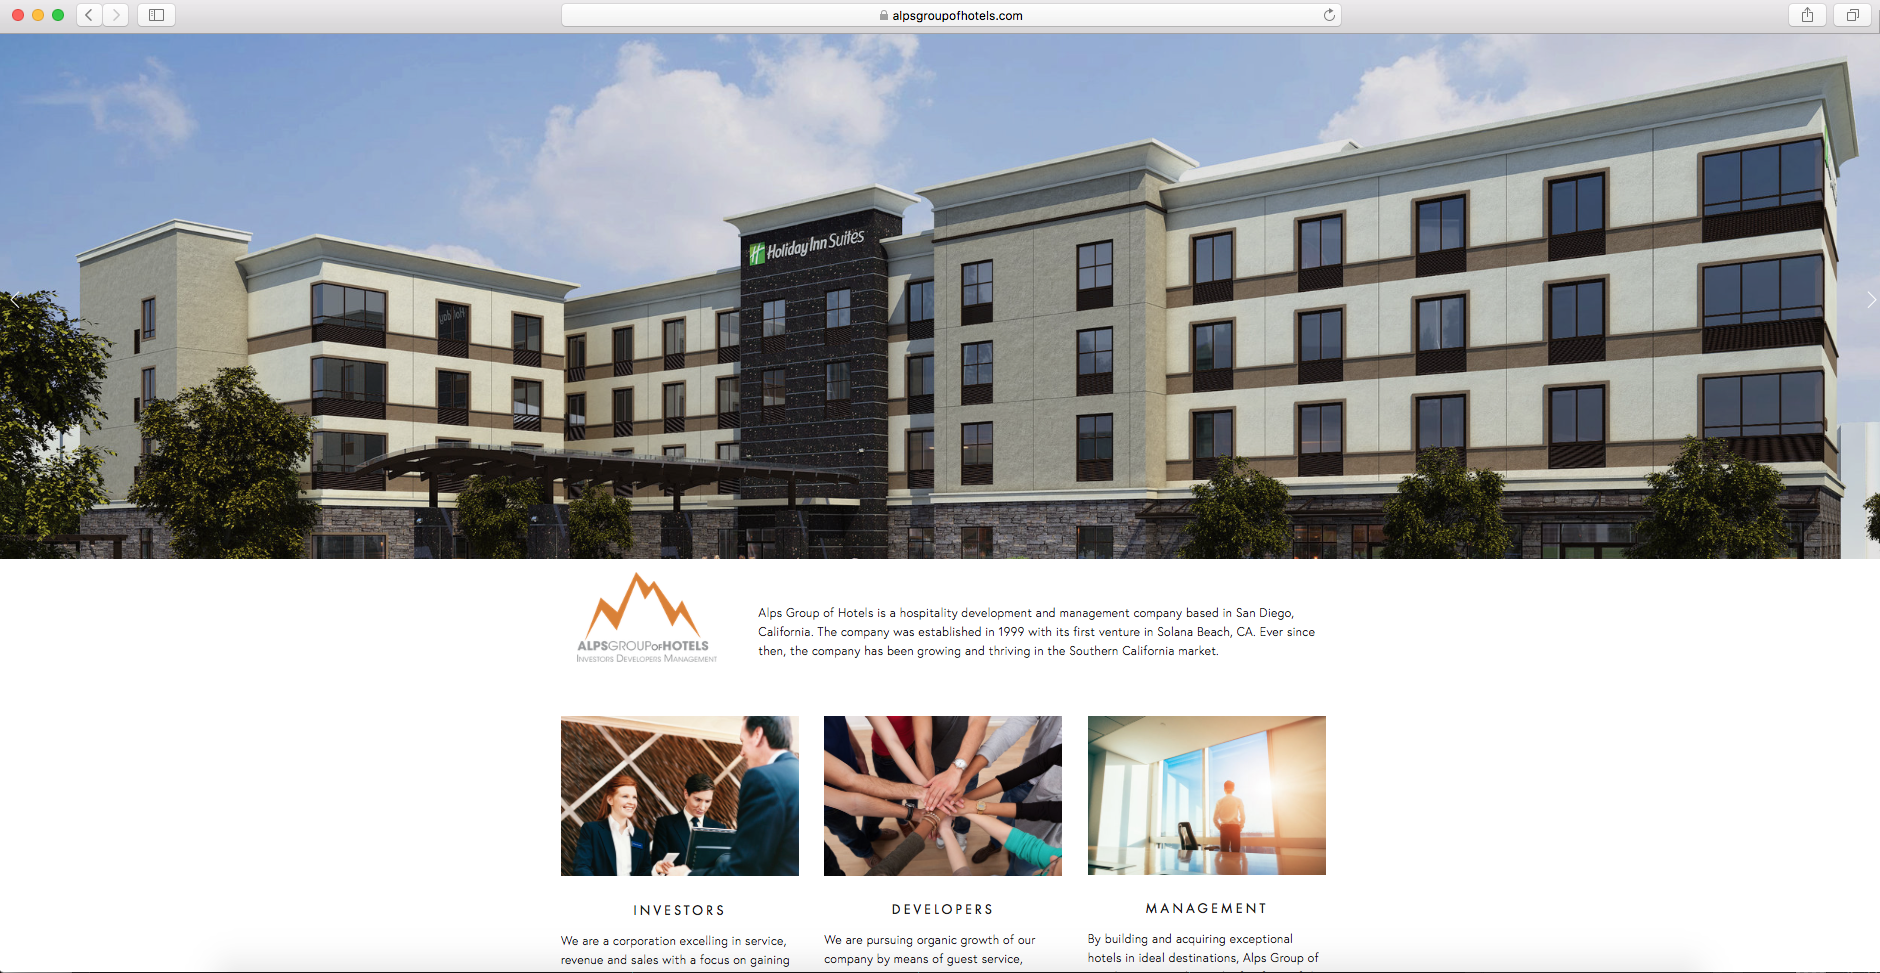 alpsgroupofhotels.com